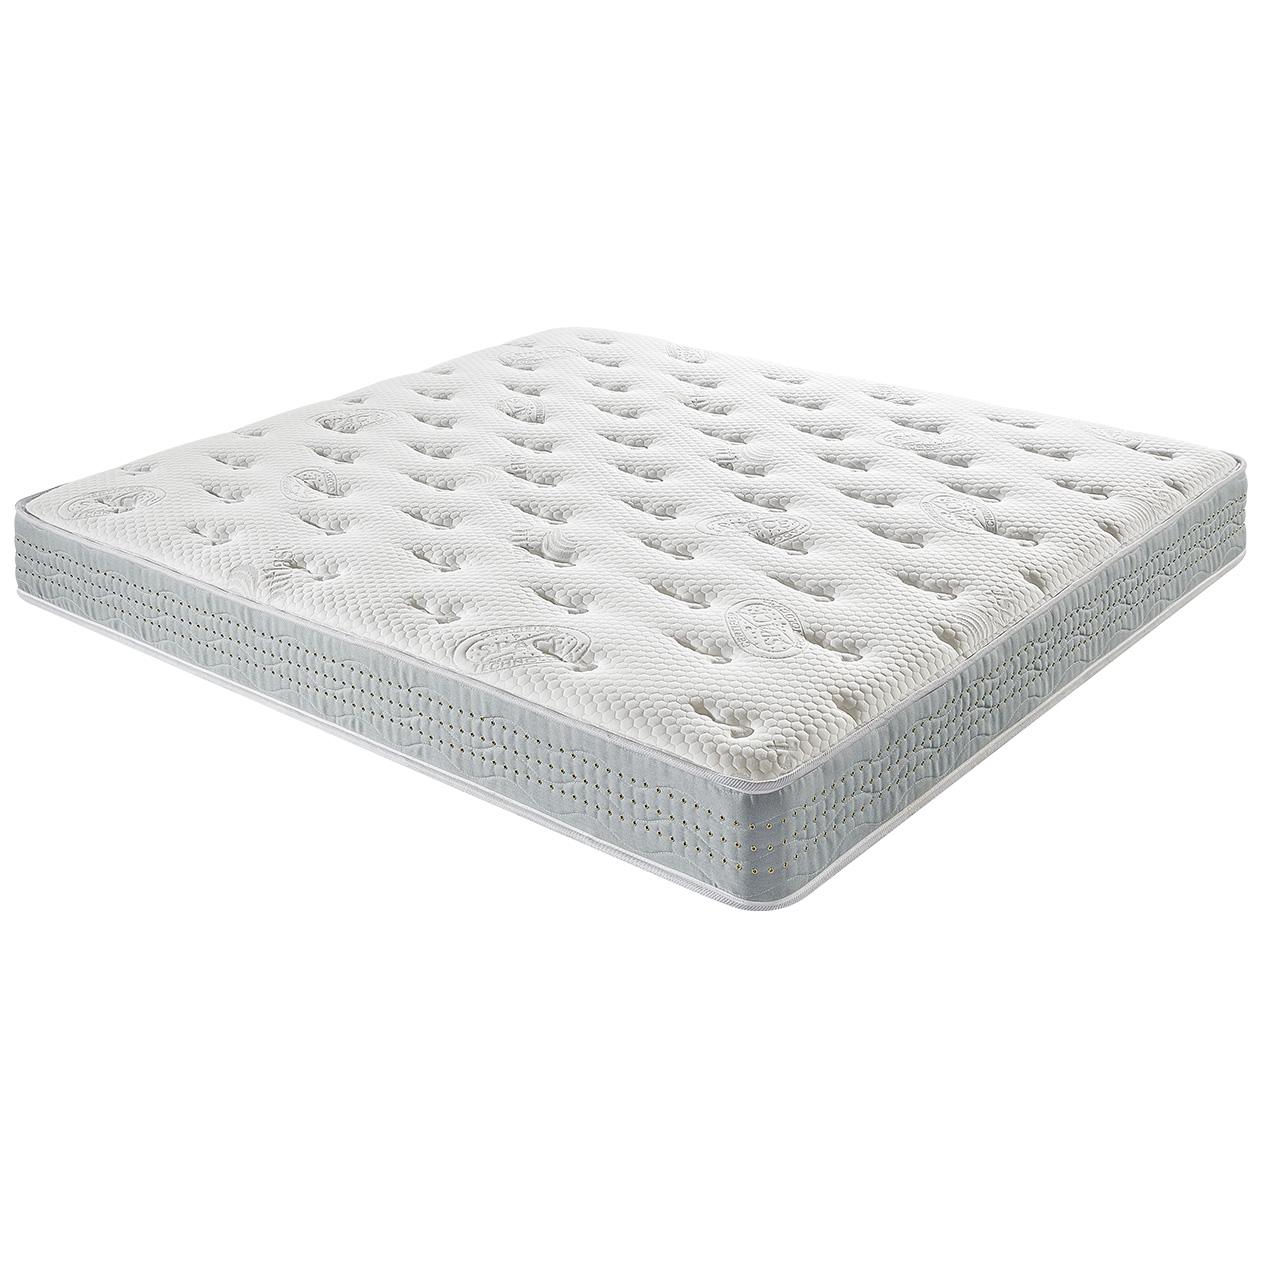 雅兰床垫air8000